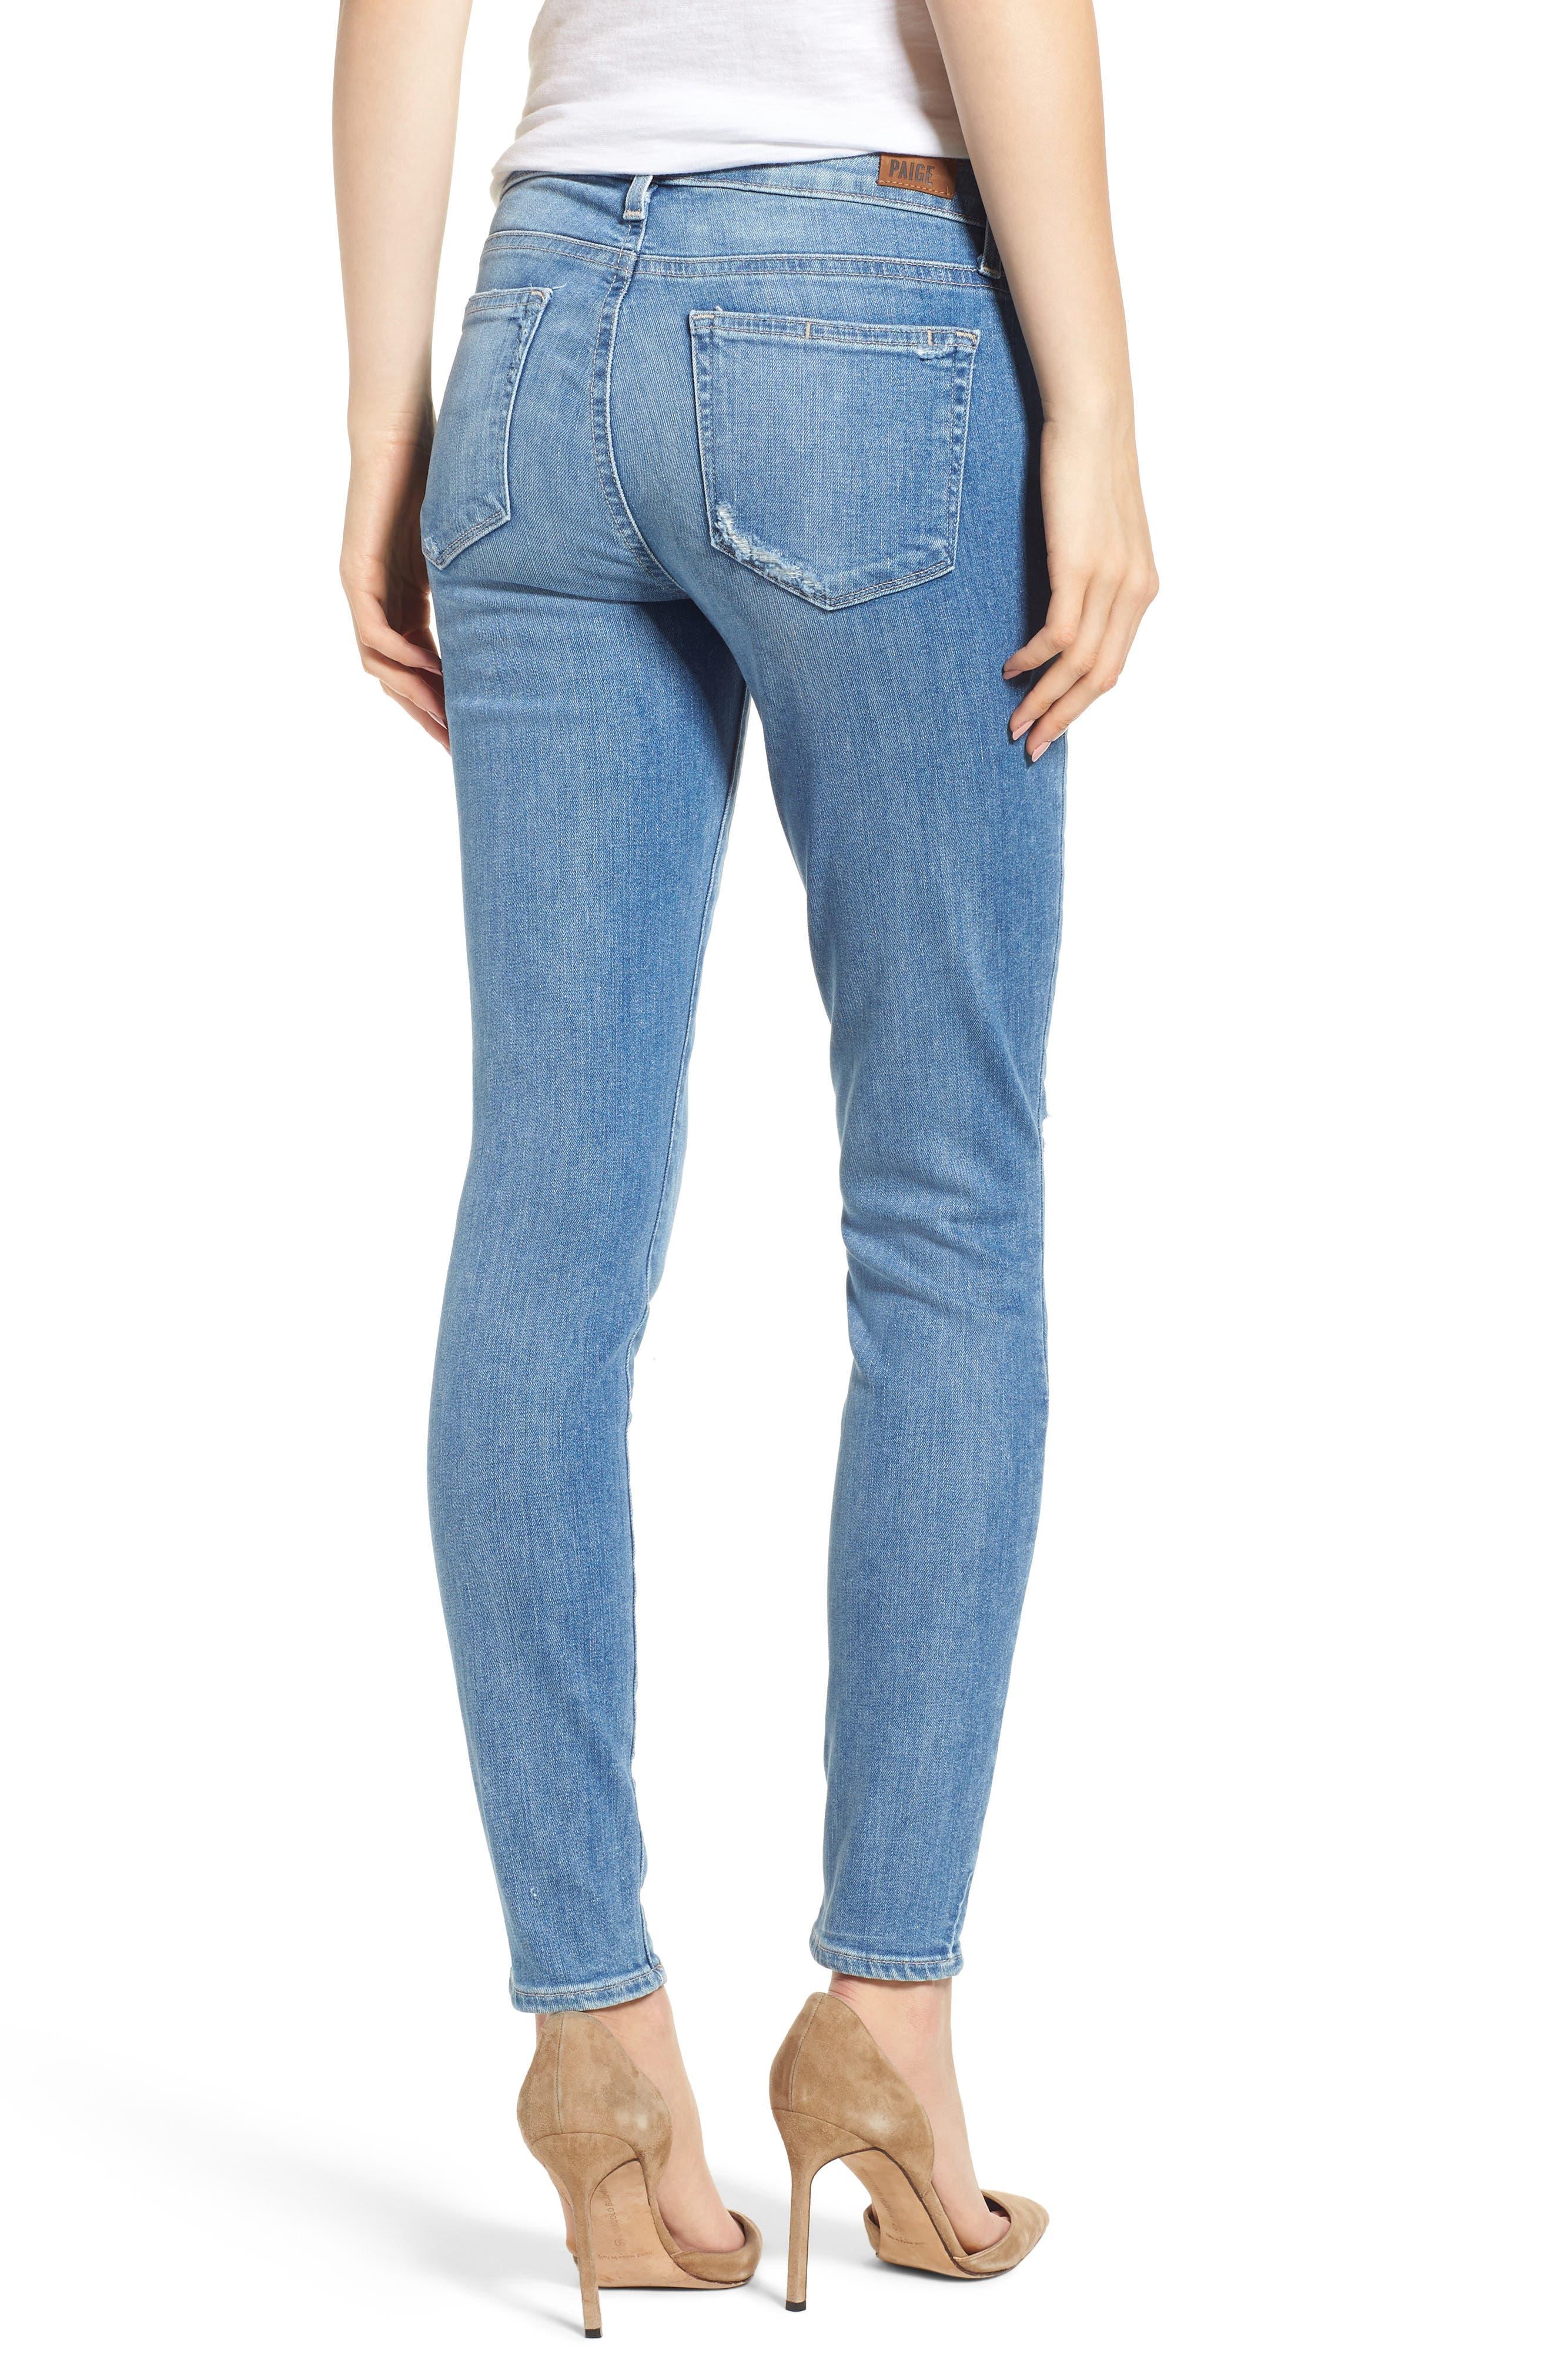 Transcend Vintage - Verdugo Ultra Skinny Jeans,                             Alternate thumbnail 2, color,                             Atterbury